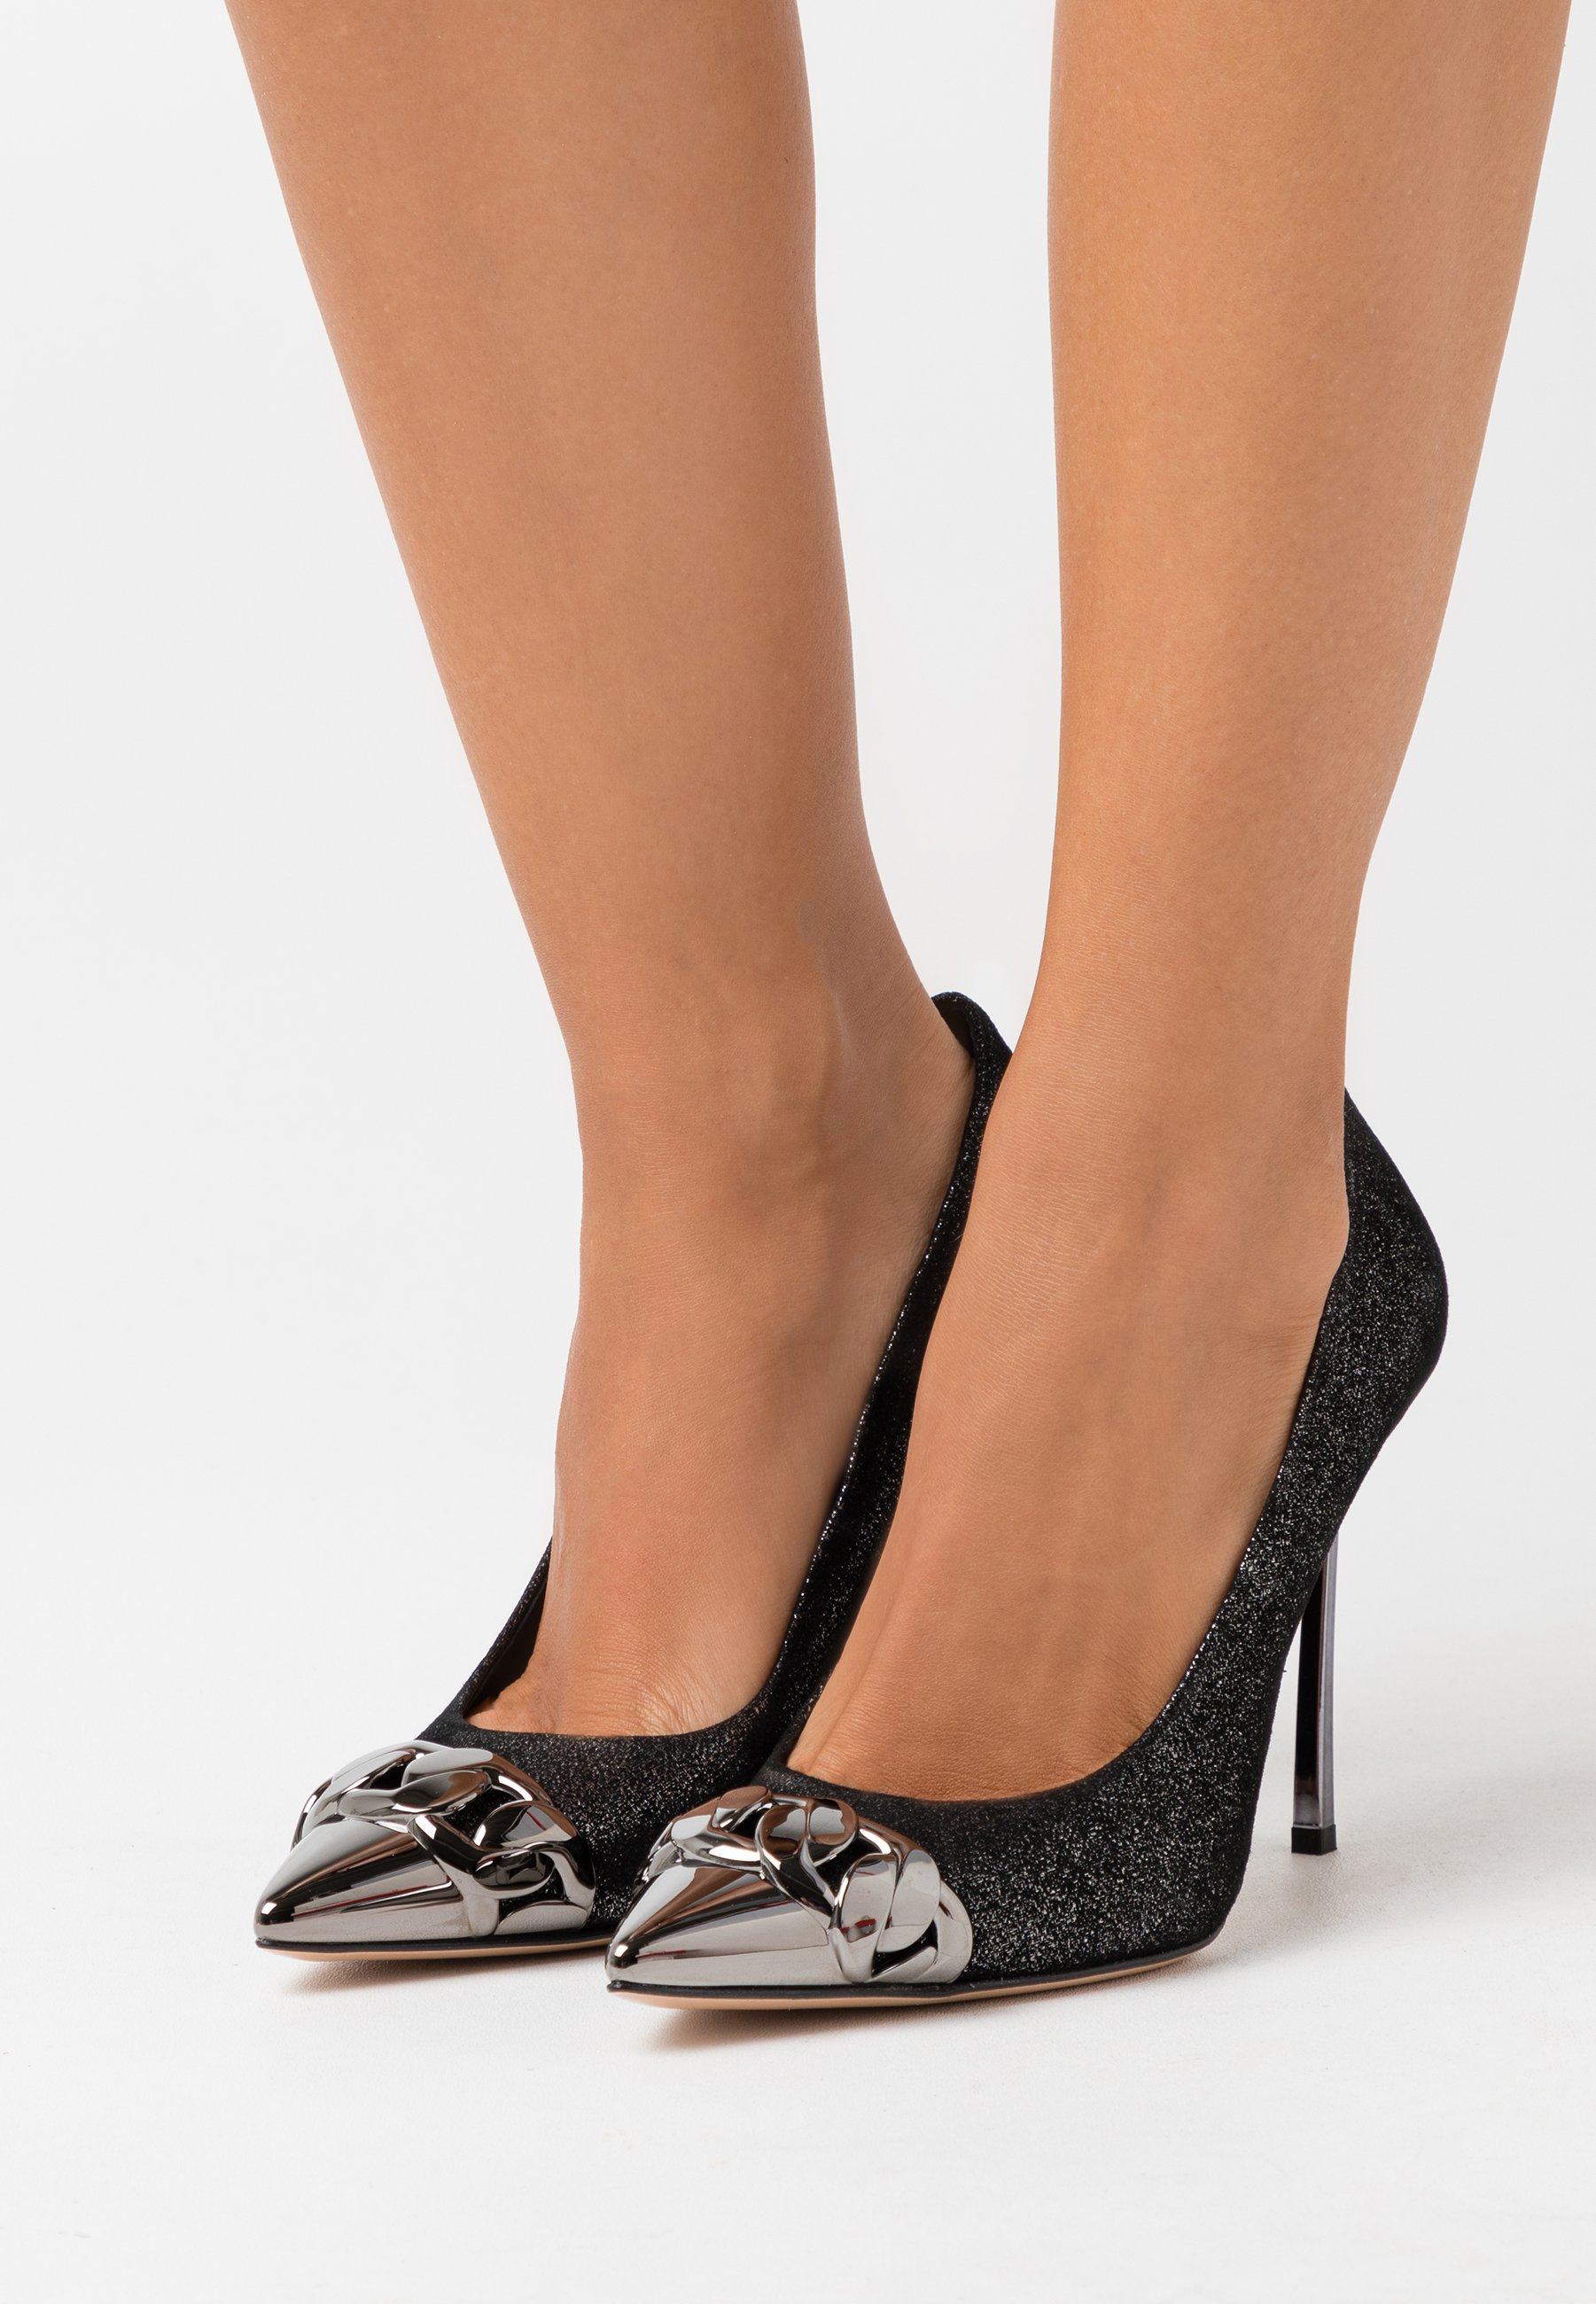 Wholesale Women's Shoes Casadei High heels dark phoenik gunmetal CCCOf1QnJ